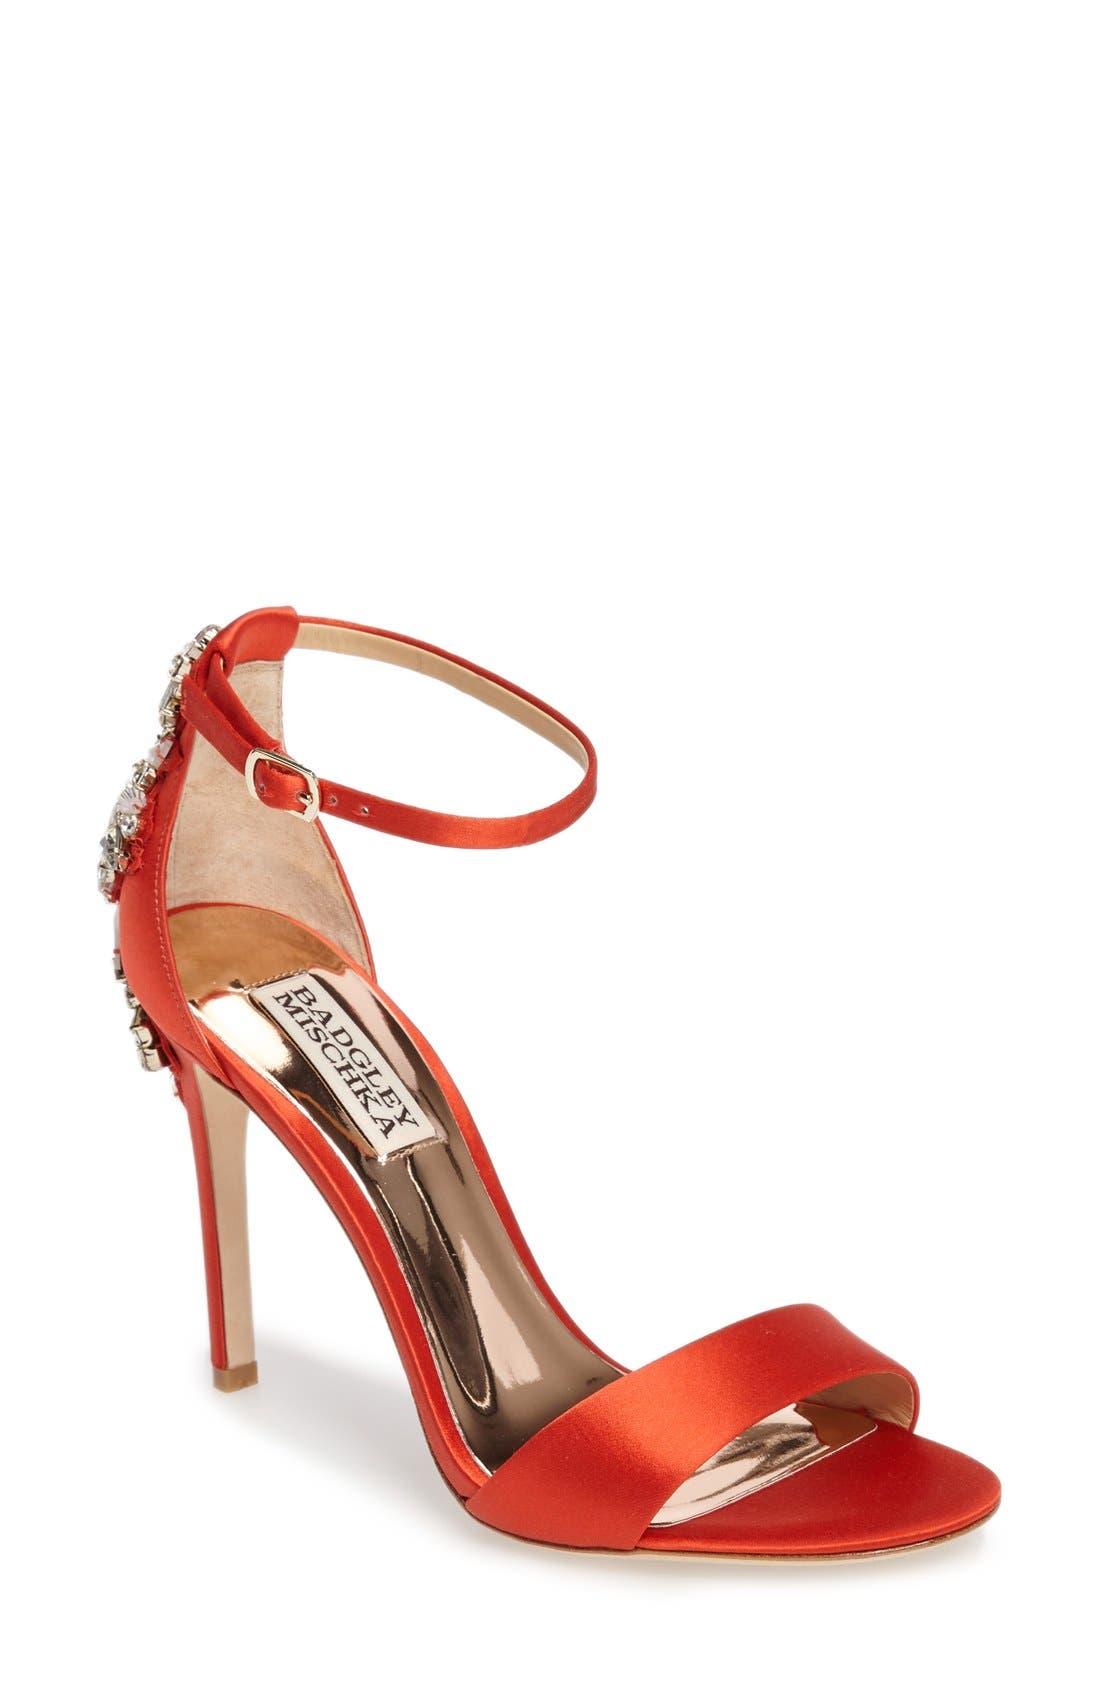 Alternate Image 1 Selected - Badgley Mischka Bartley Ankle Strap Sandal (Women)